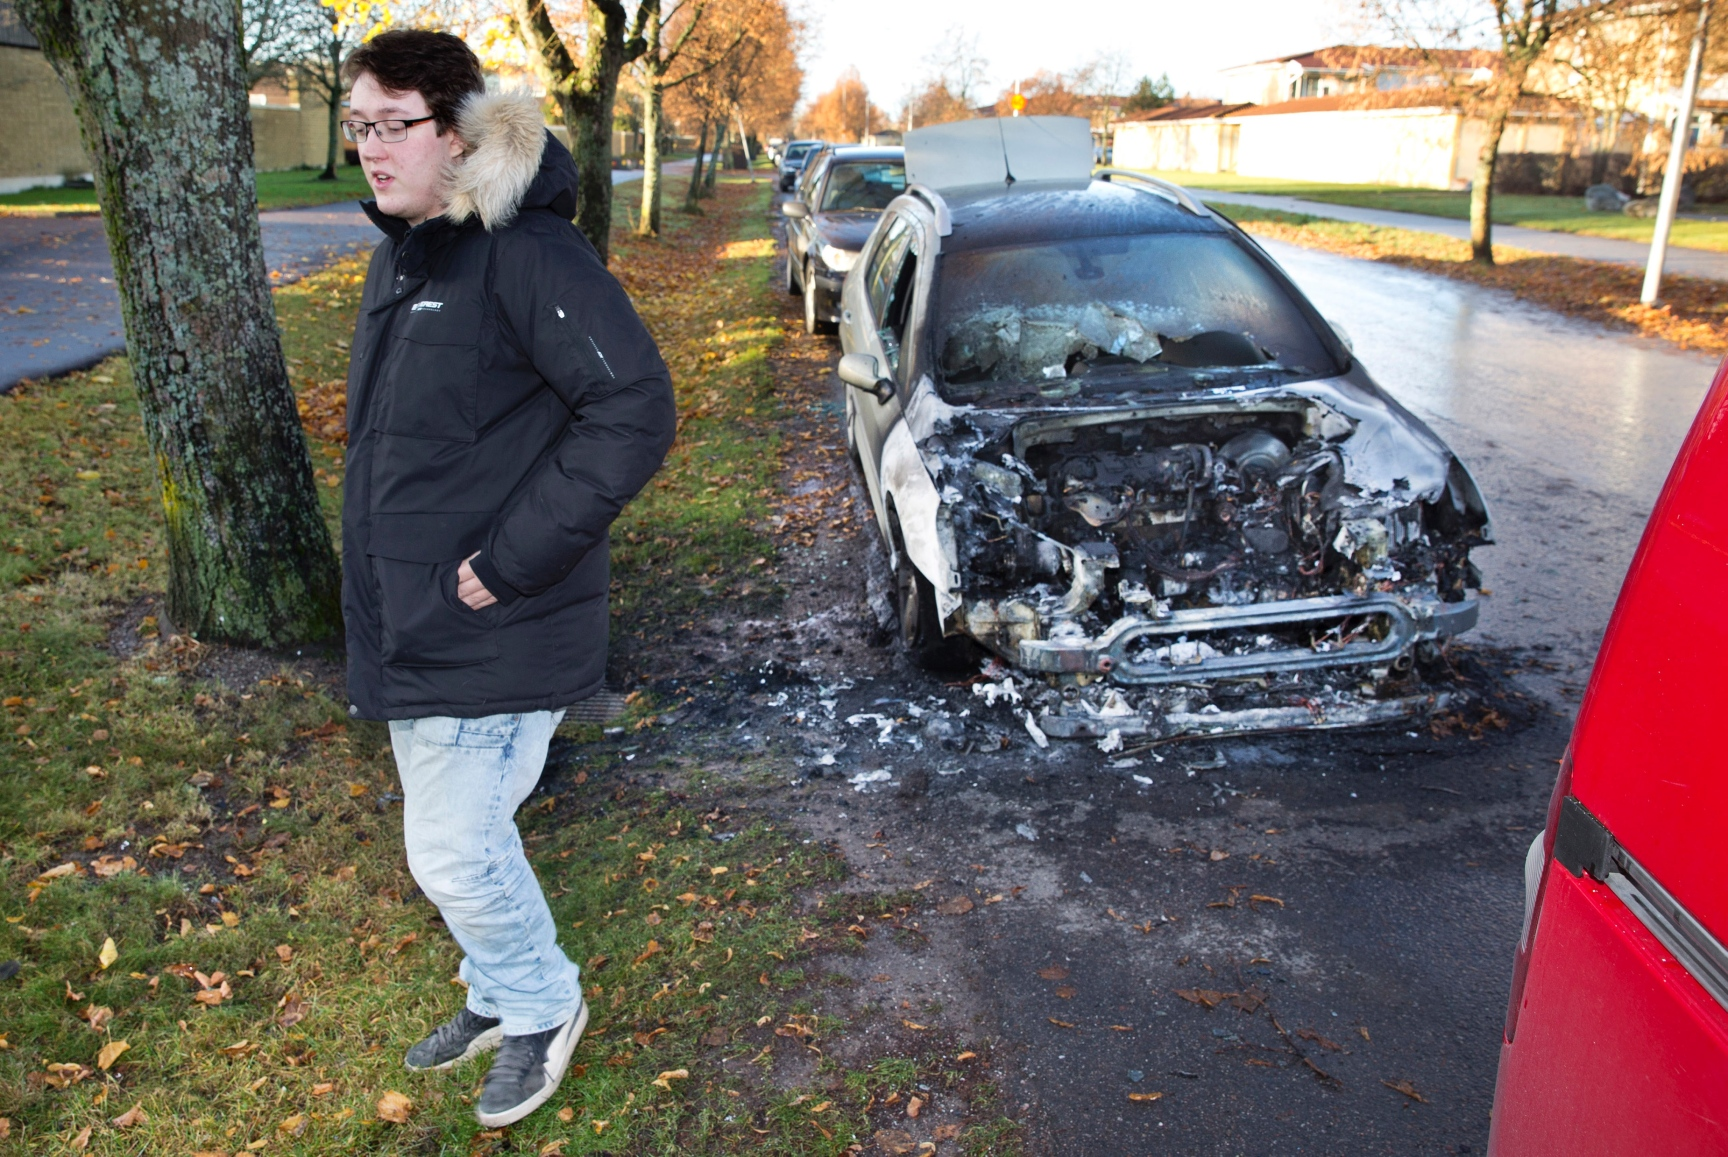 Annu en bilbrand i vasteras